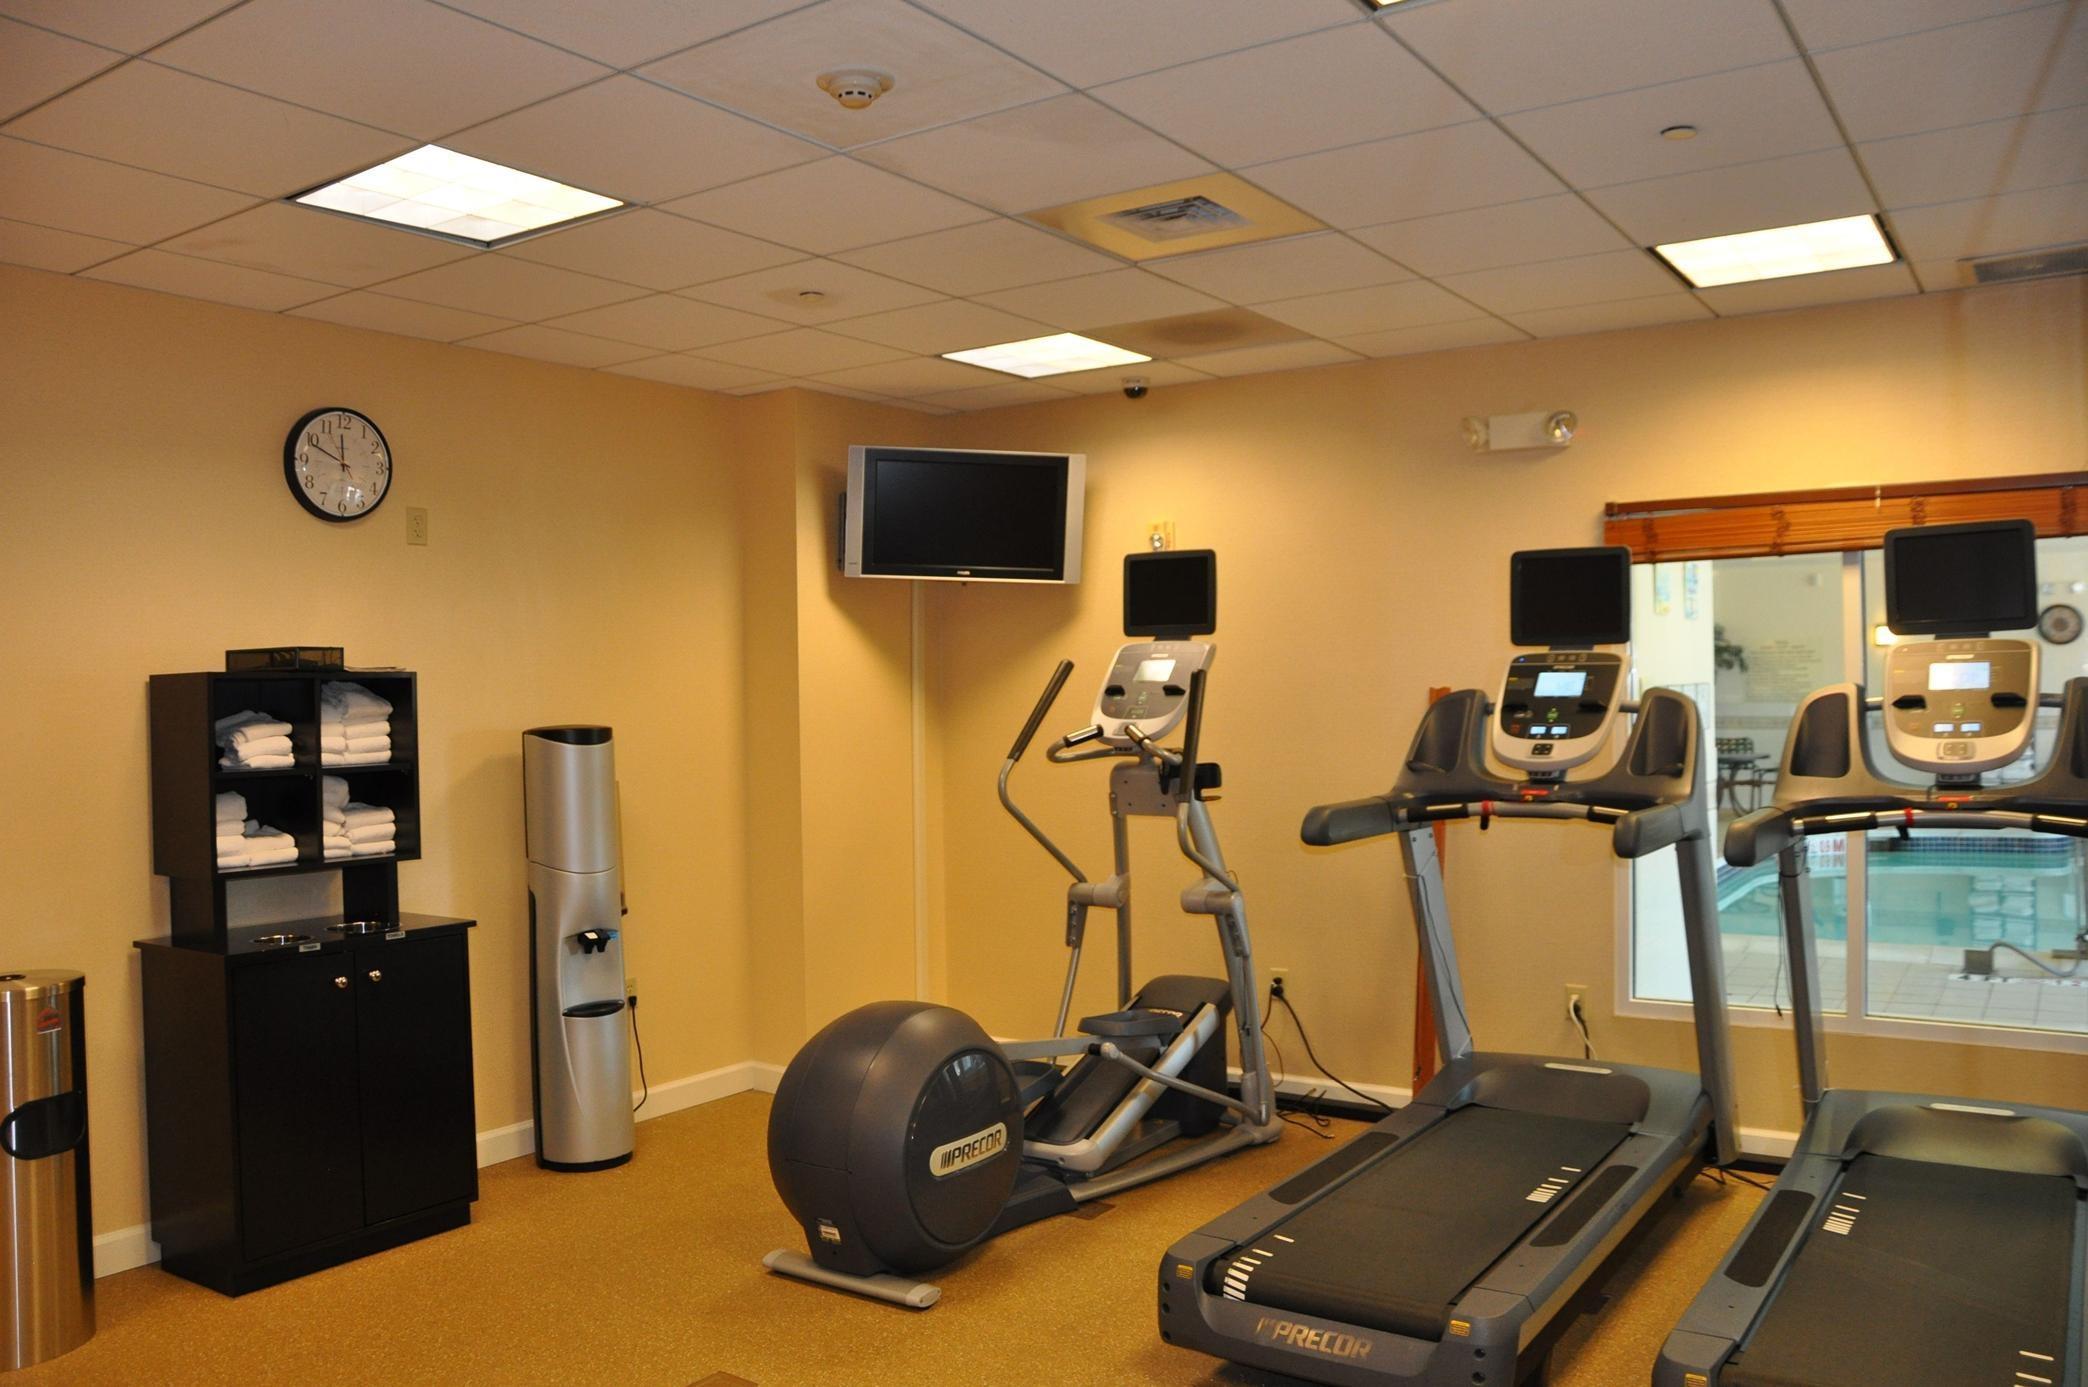 Hilton Garden Inn Harrisburg East 3943 Tecport Drive Harrisburg, PA Hotels  U0026 Motels   MapQuest